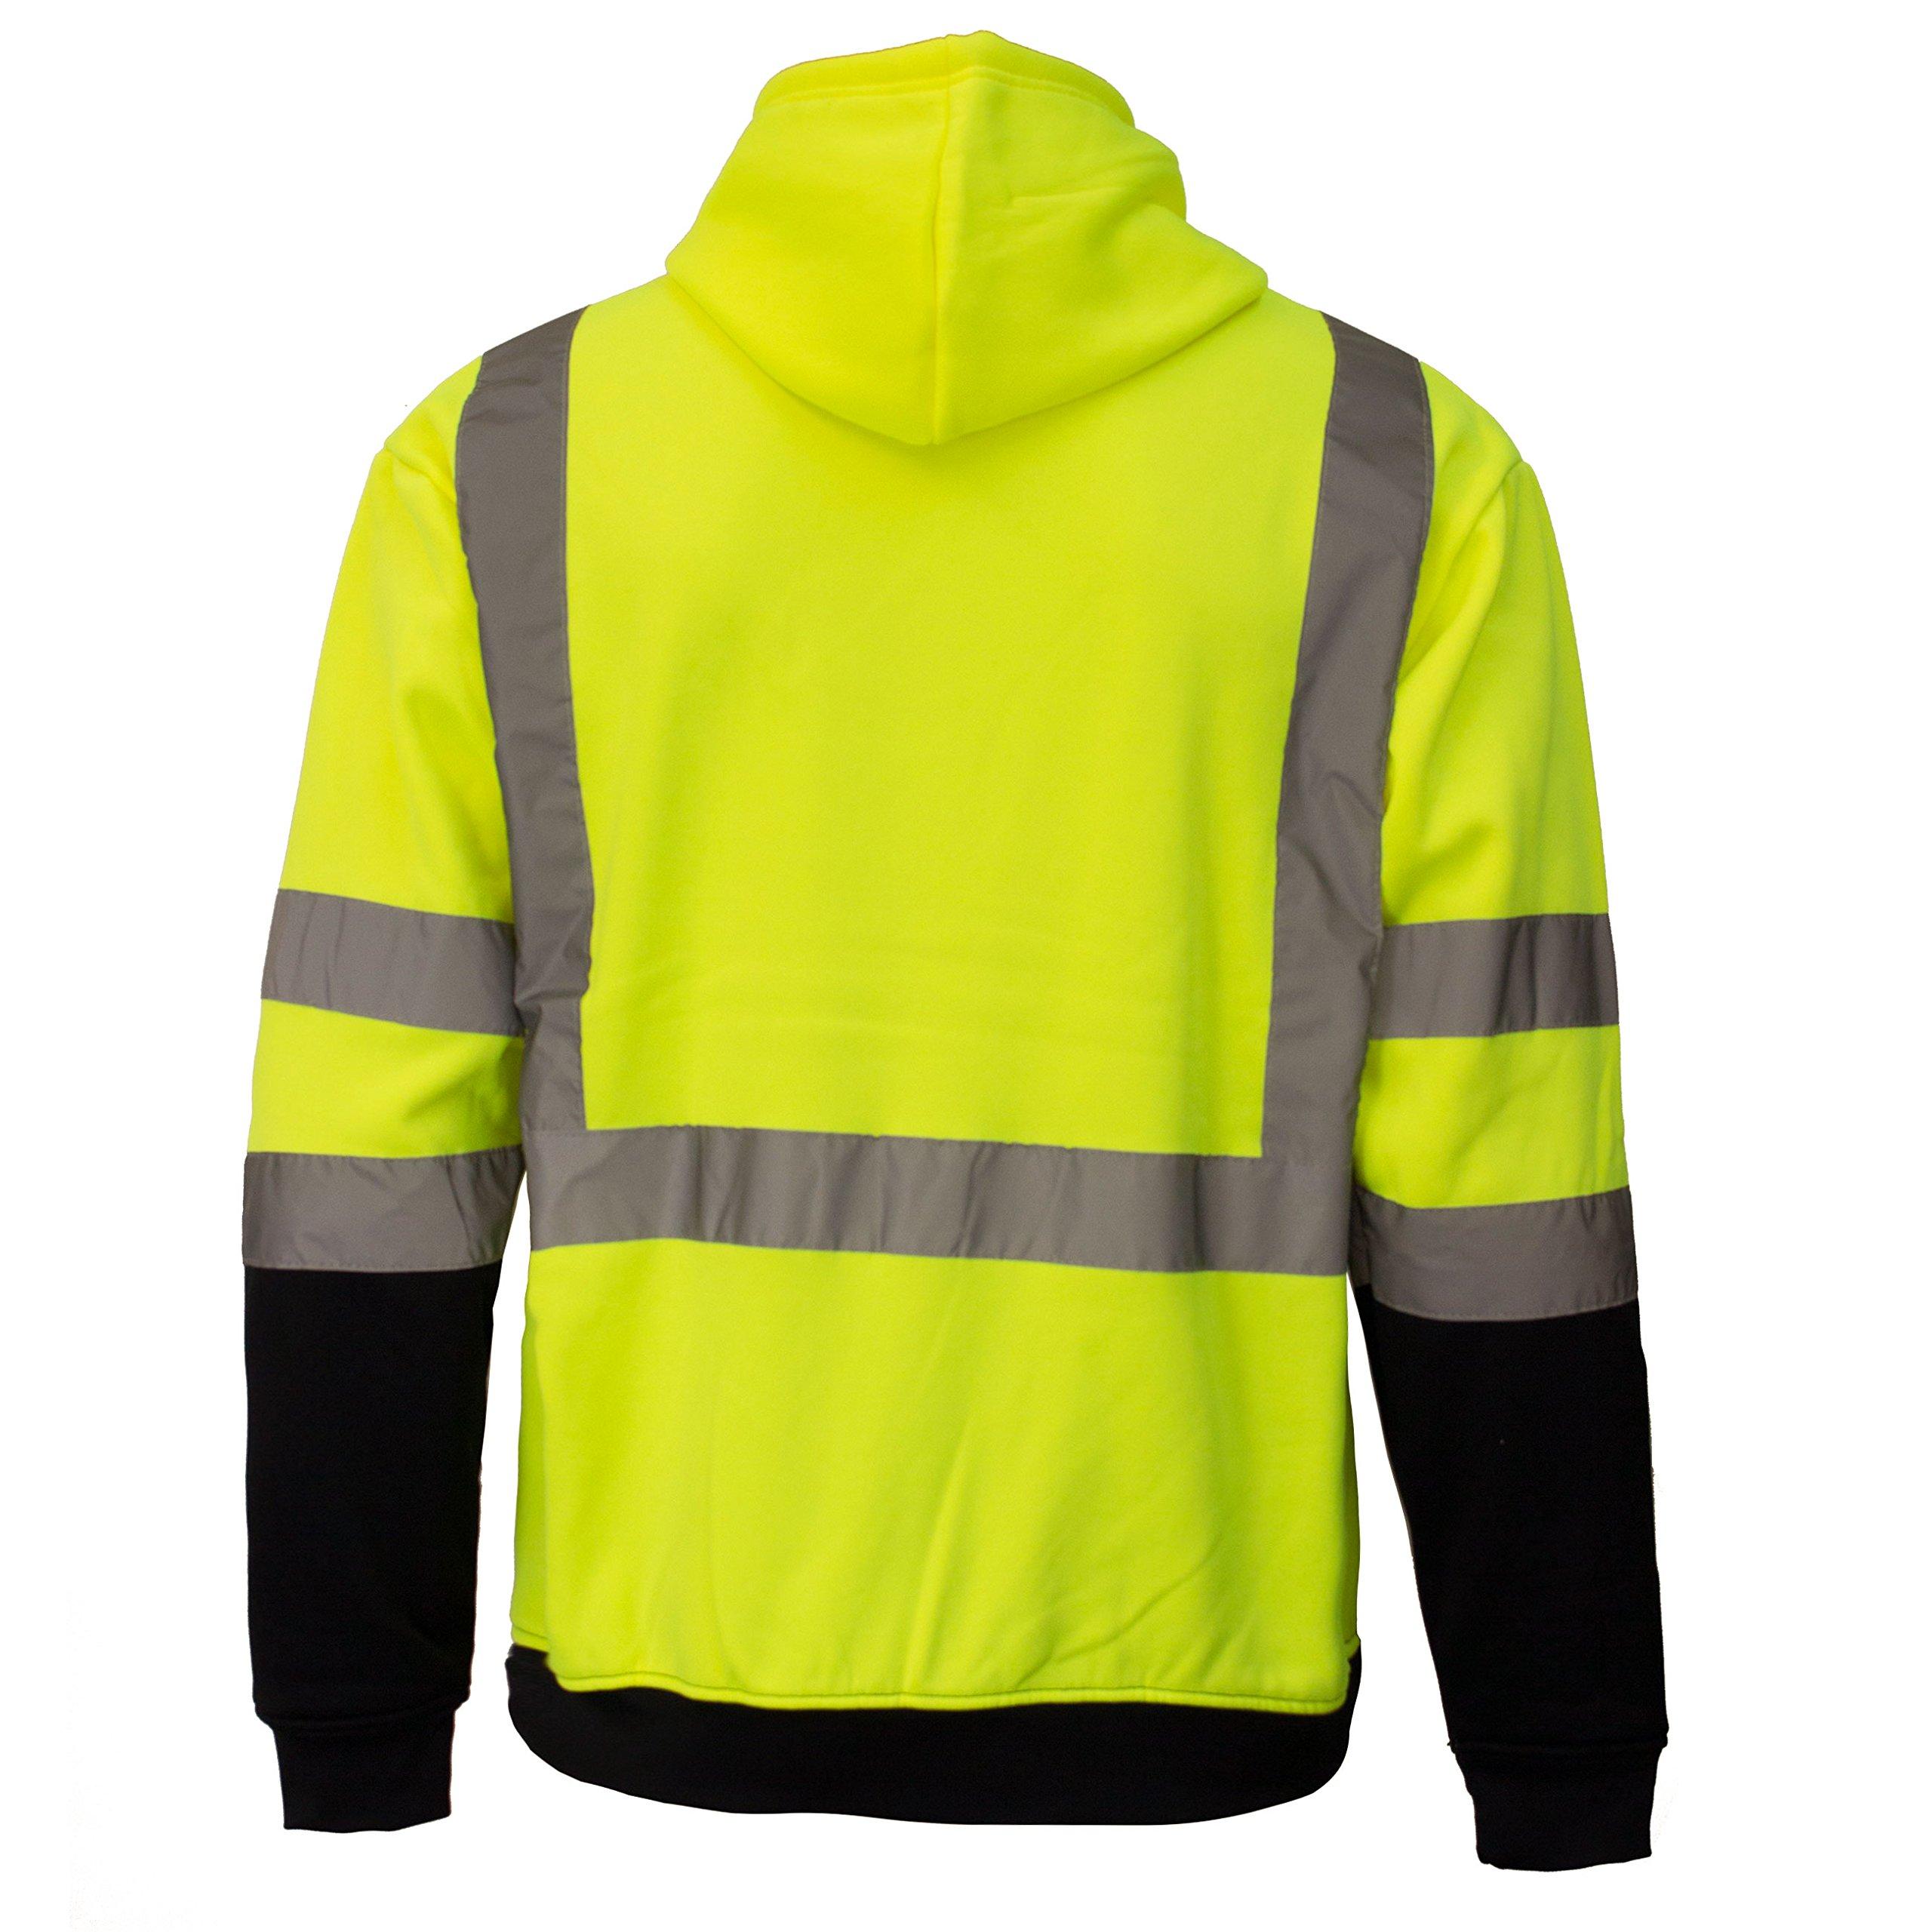 New York Hi-Viz Workwear H8312 Men's ANSI Class 3 High Visibility Class 3 Sweatshirt, Hooded Pullover, Knit Lining, Black Bottom (Lime, Large) by New York Hi-Viz Workwear (Image #3)